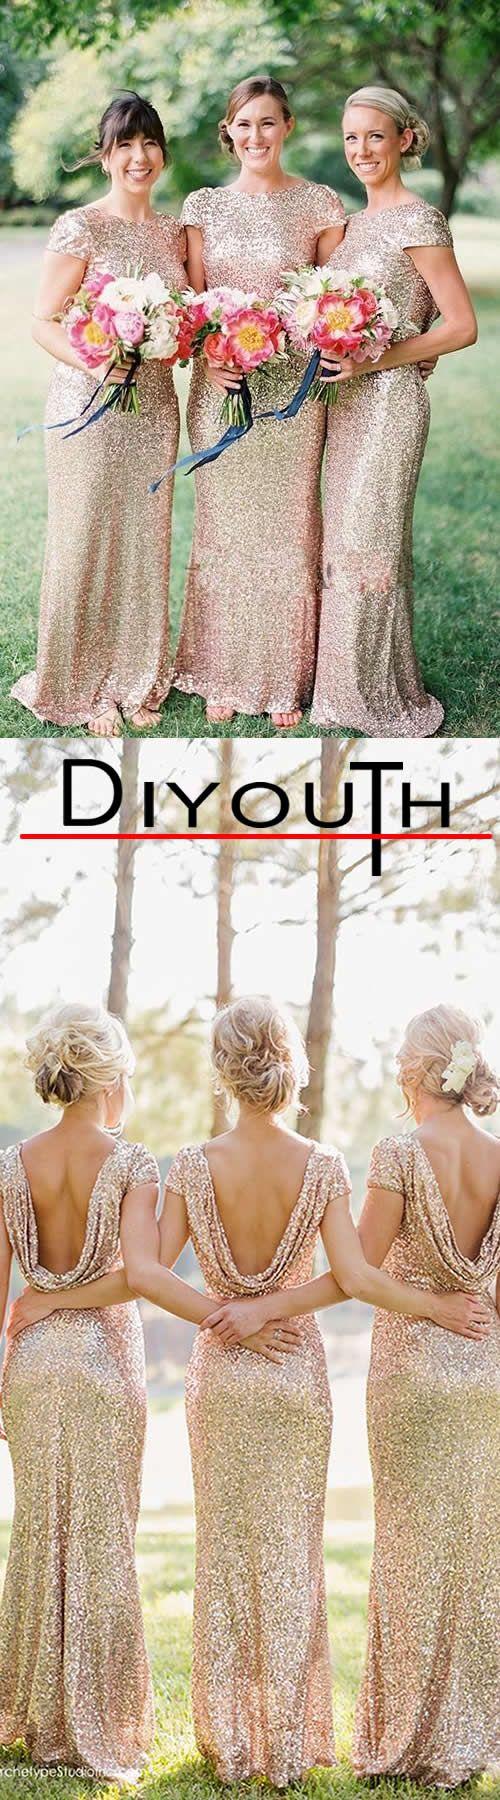 Diyouth sheathcolumn jewel sweepbrush train sequined